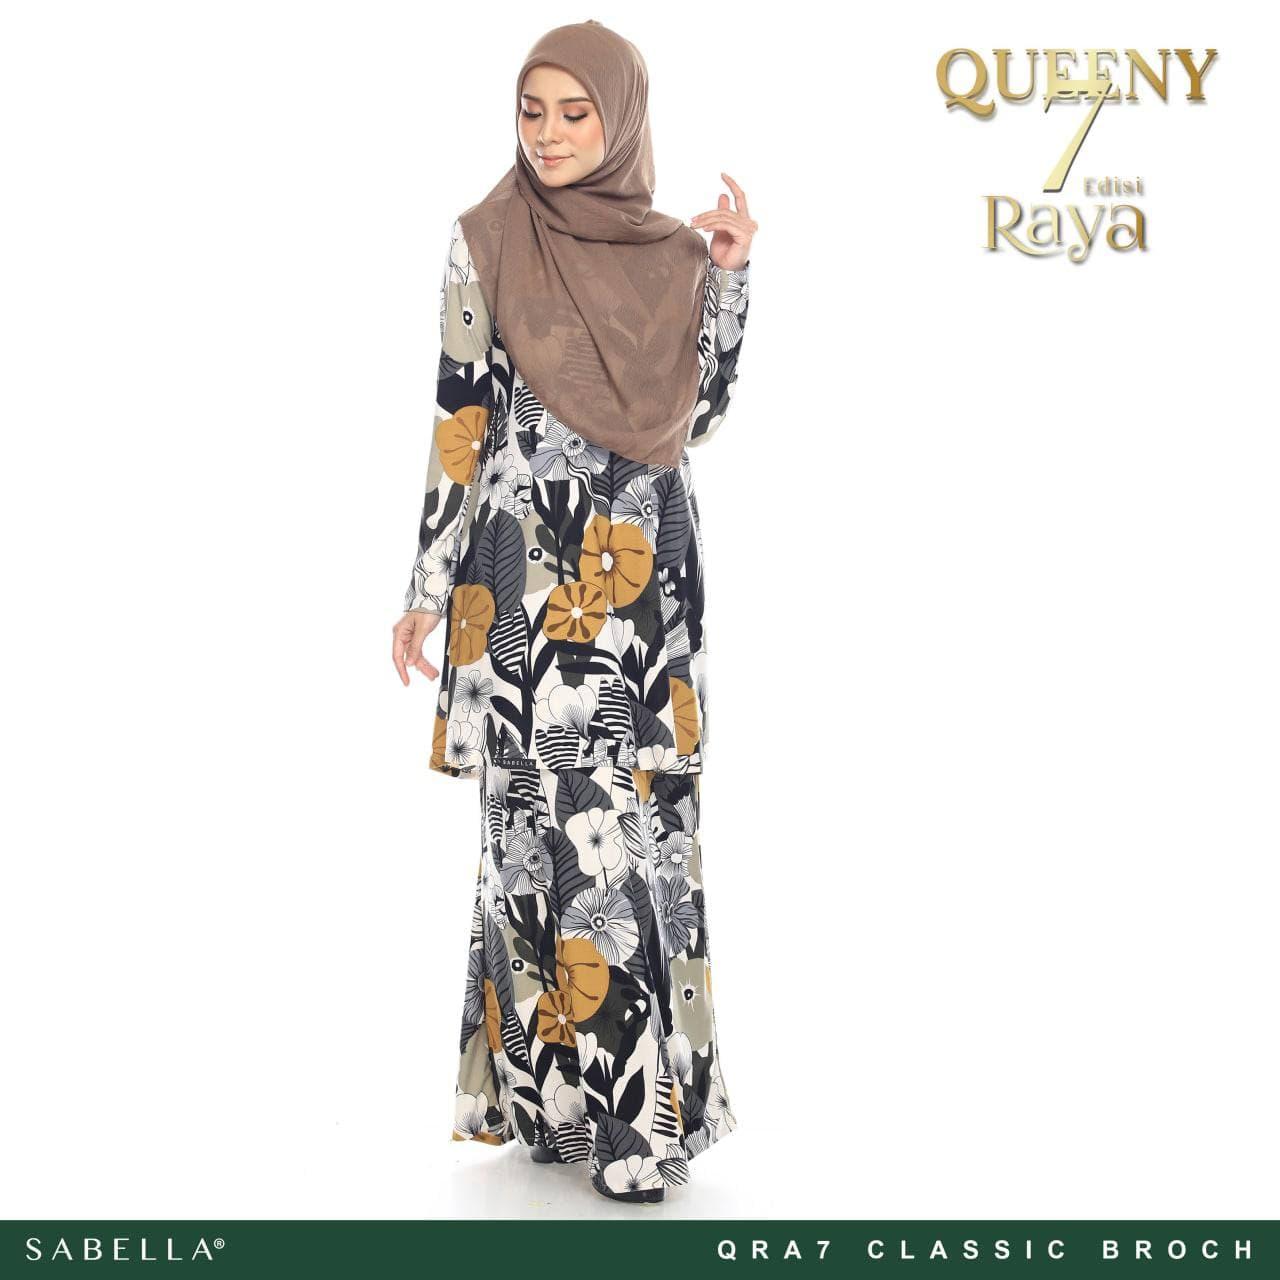 Queeny Raya 7.0 Classic Broch